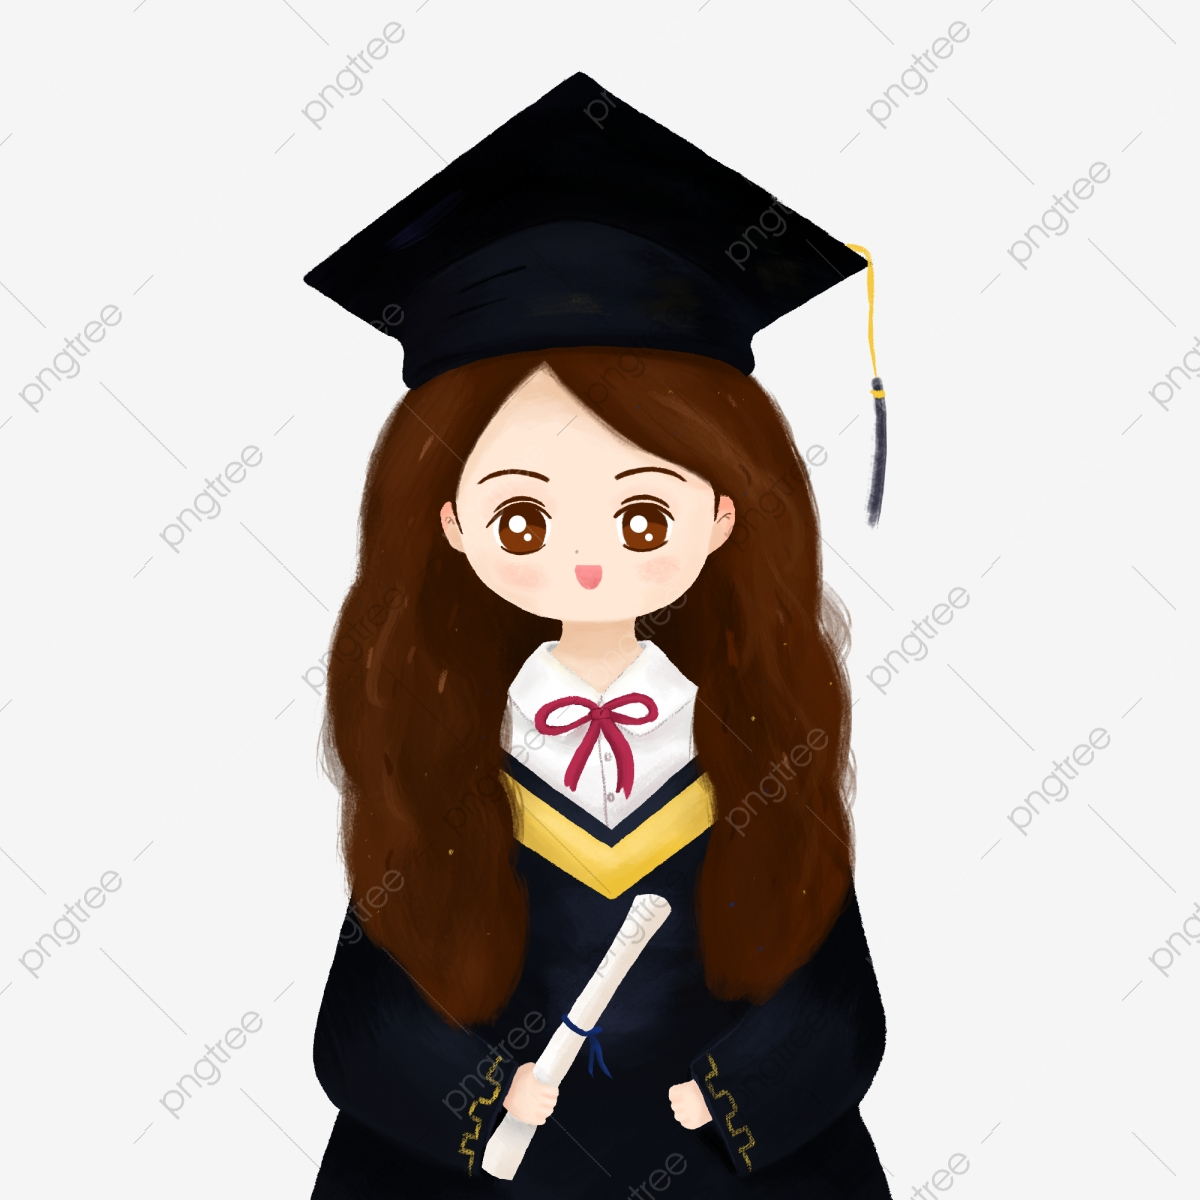 Diploma clipart doctorate degree. Cartoon graduation season doctor